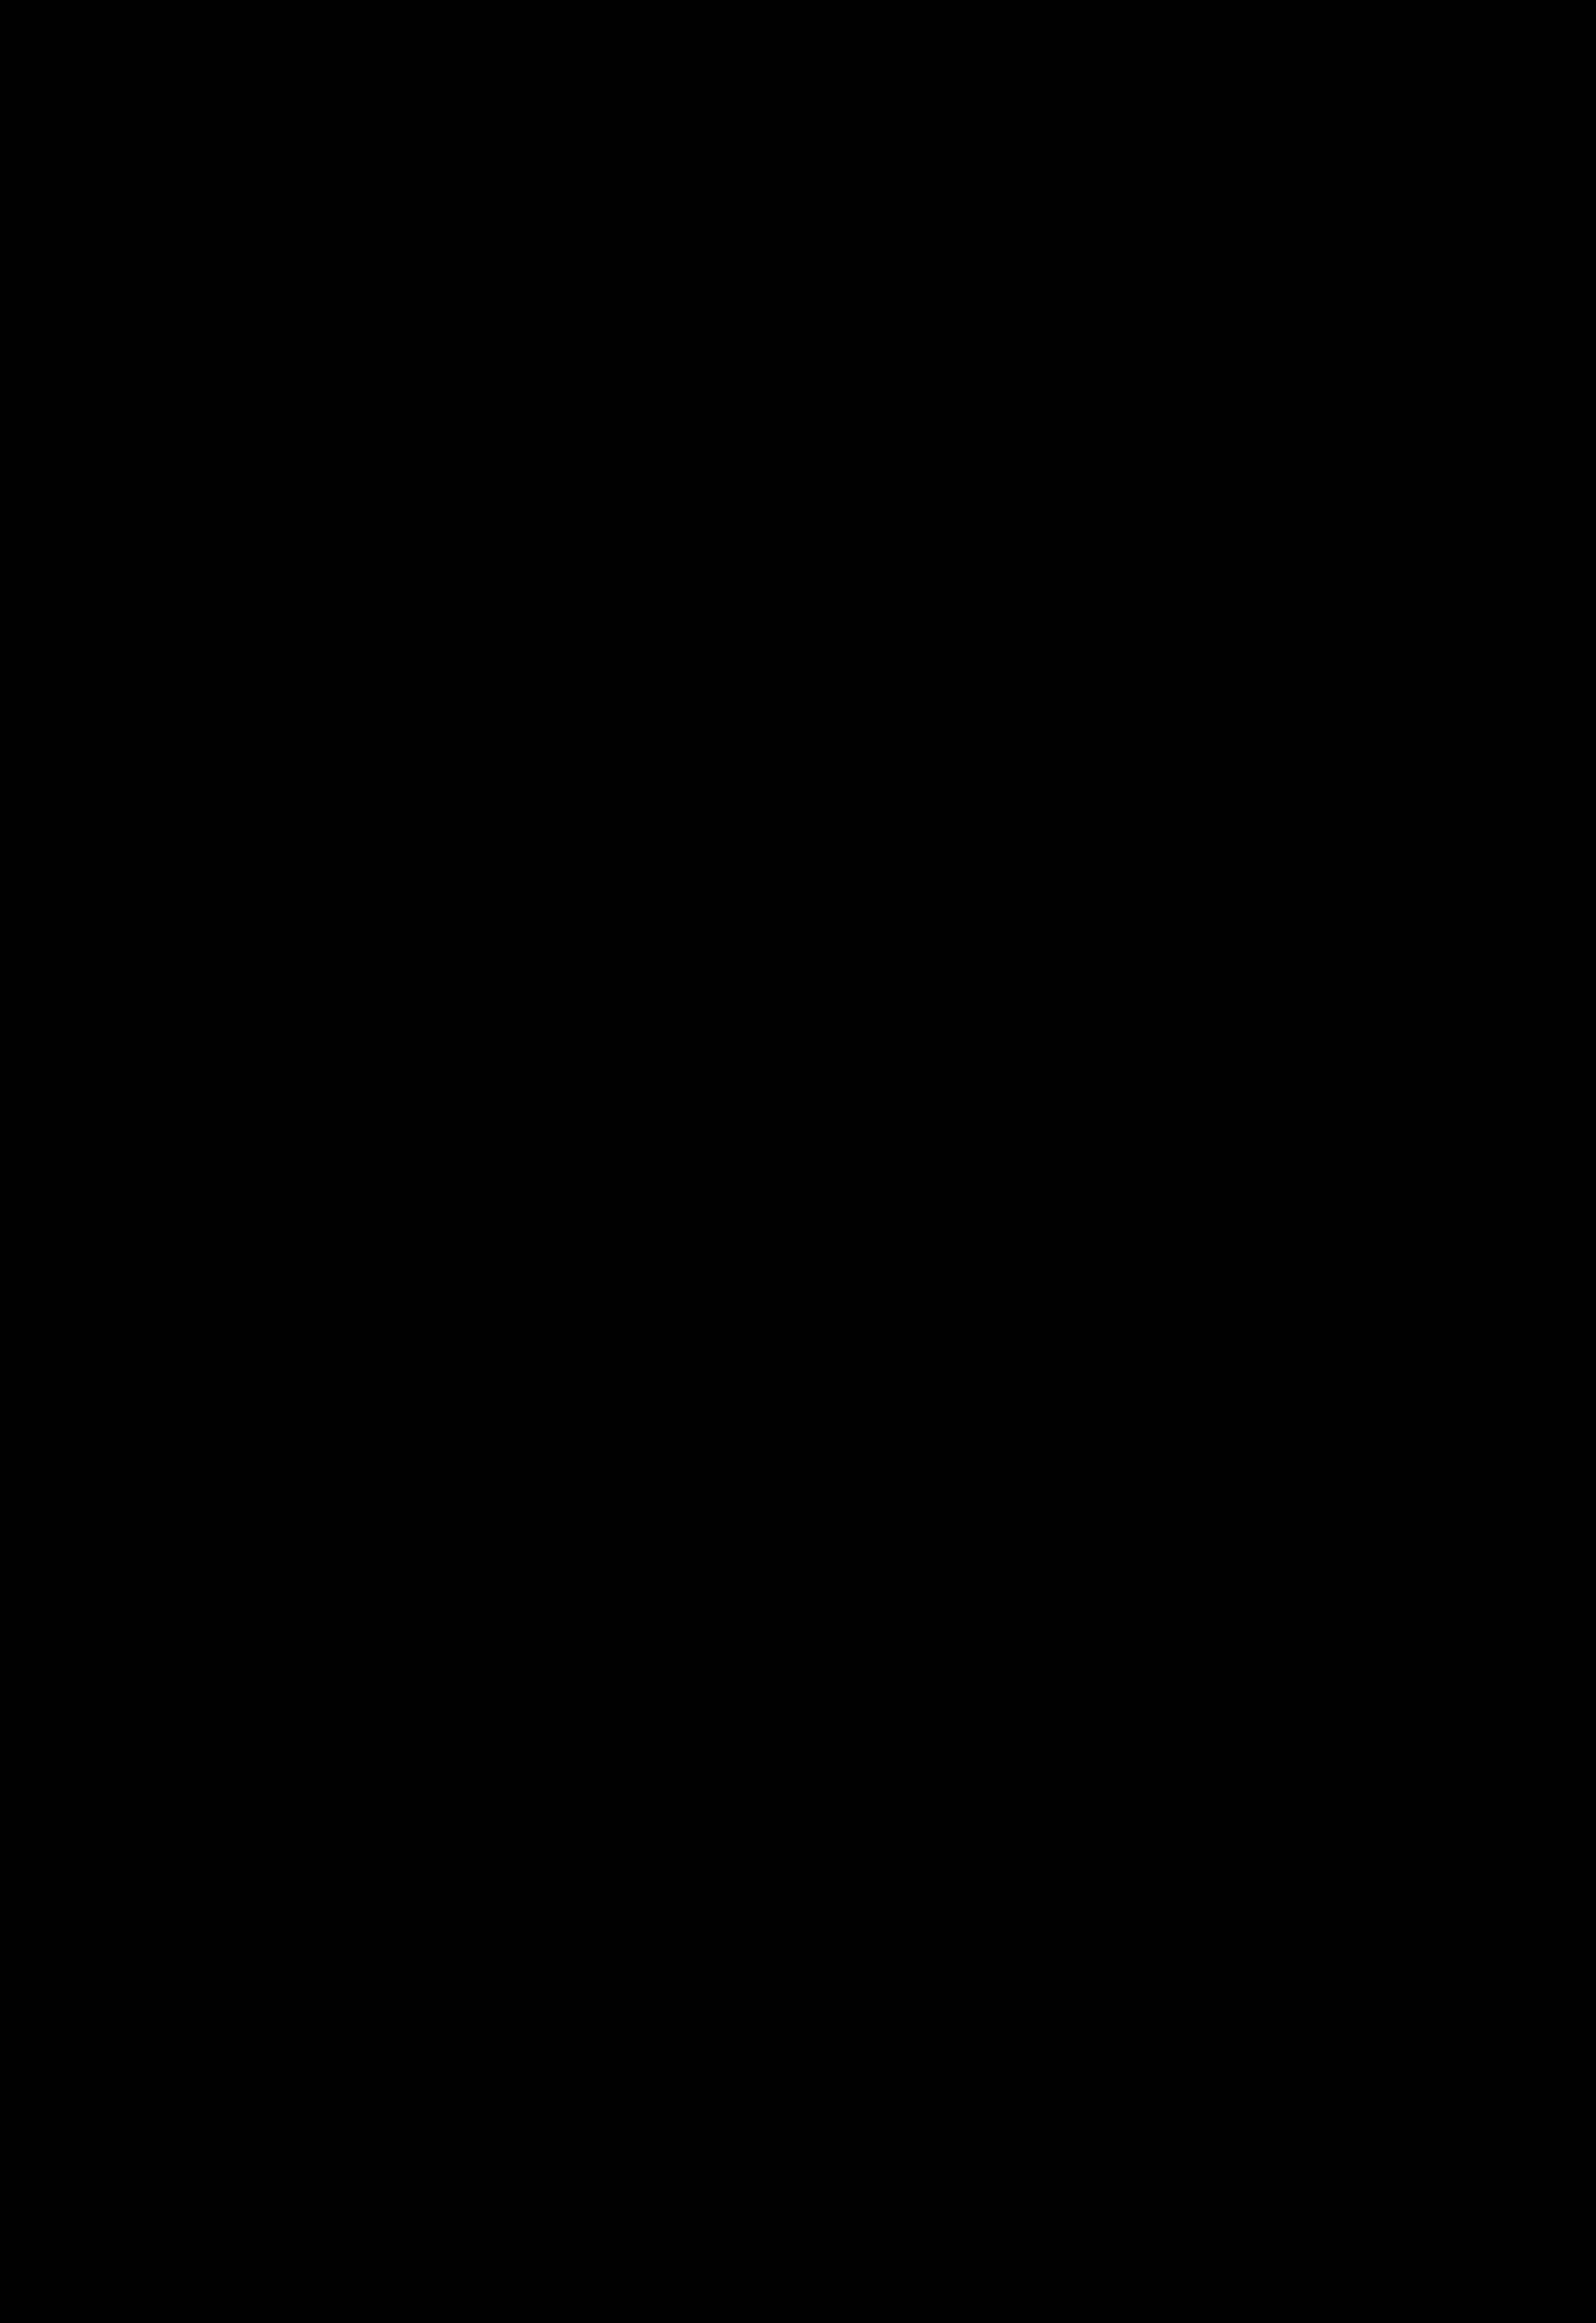 fallingdevil